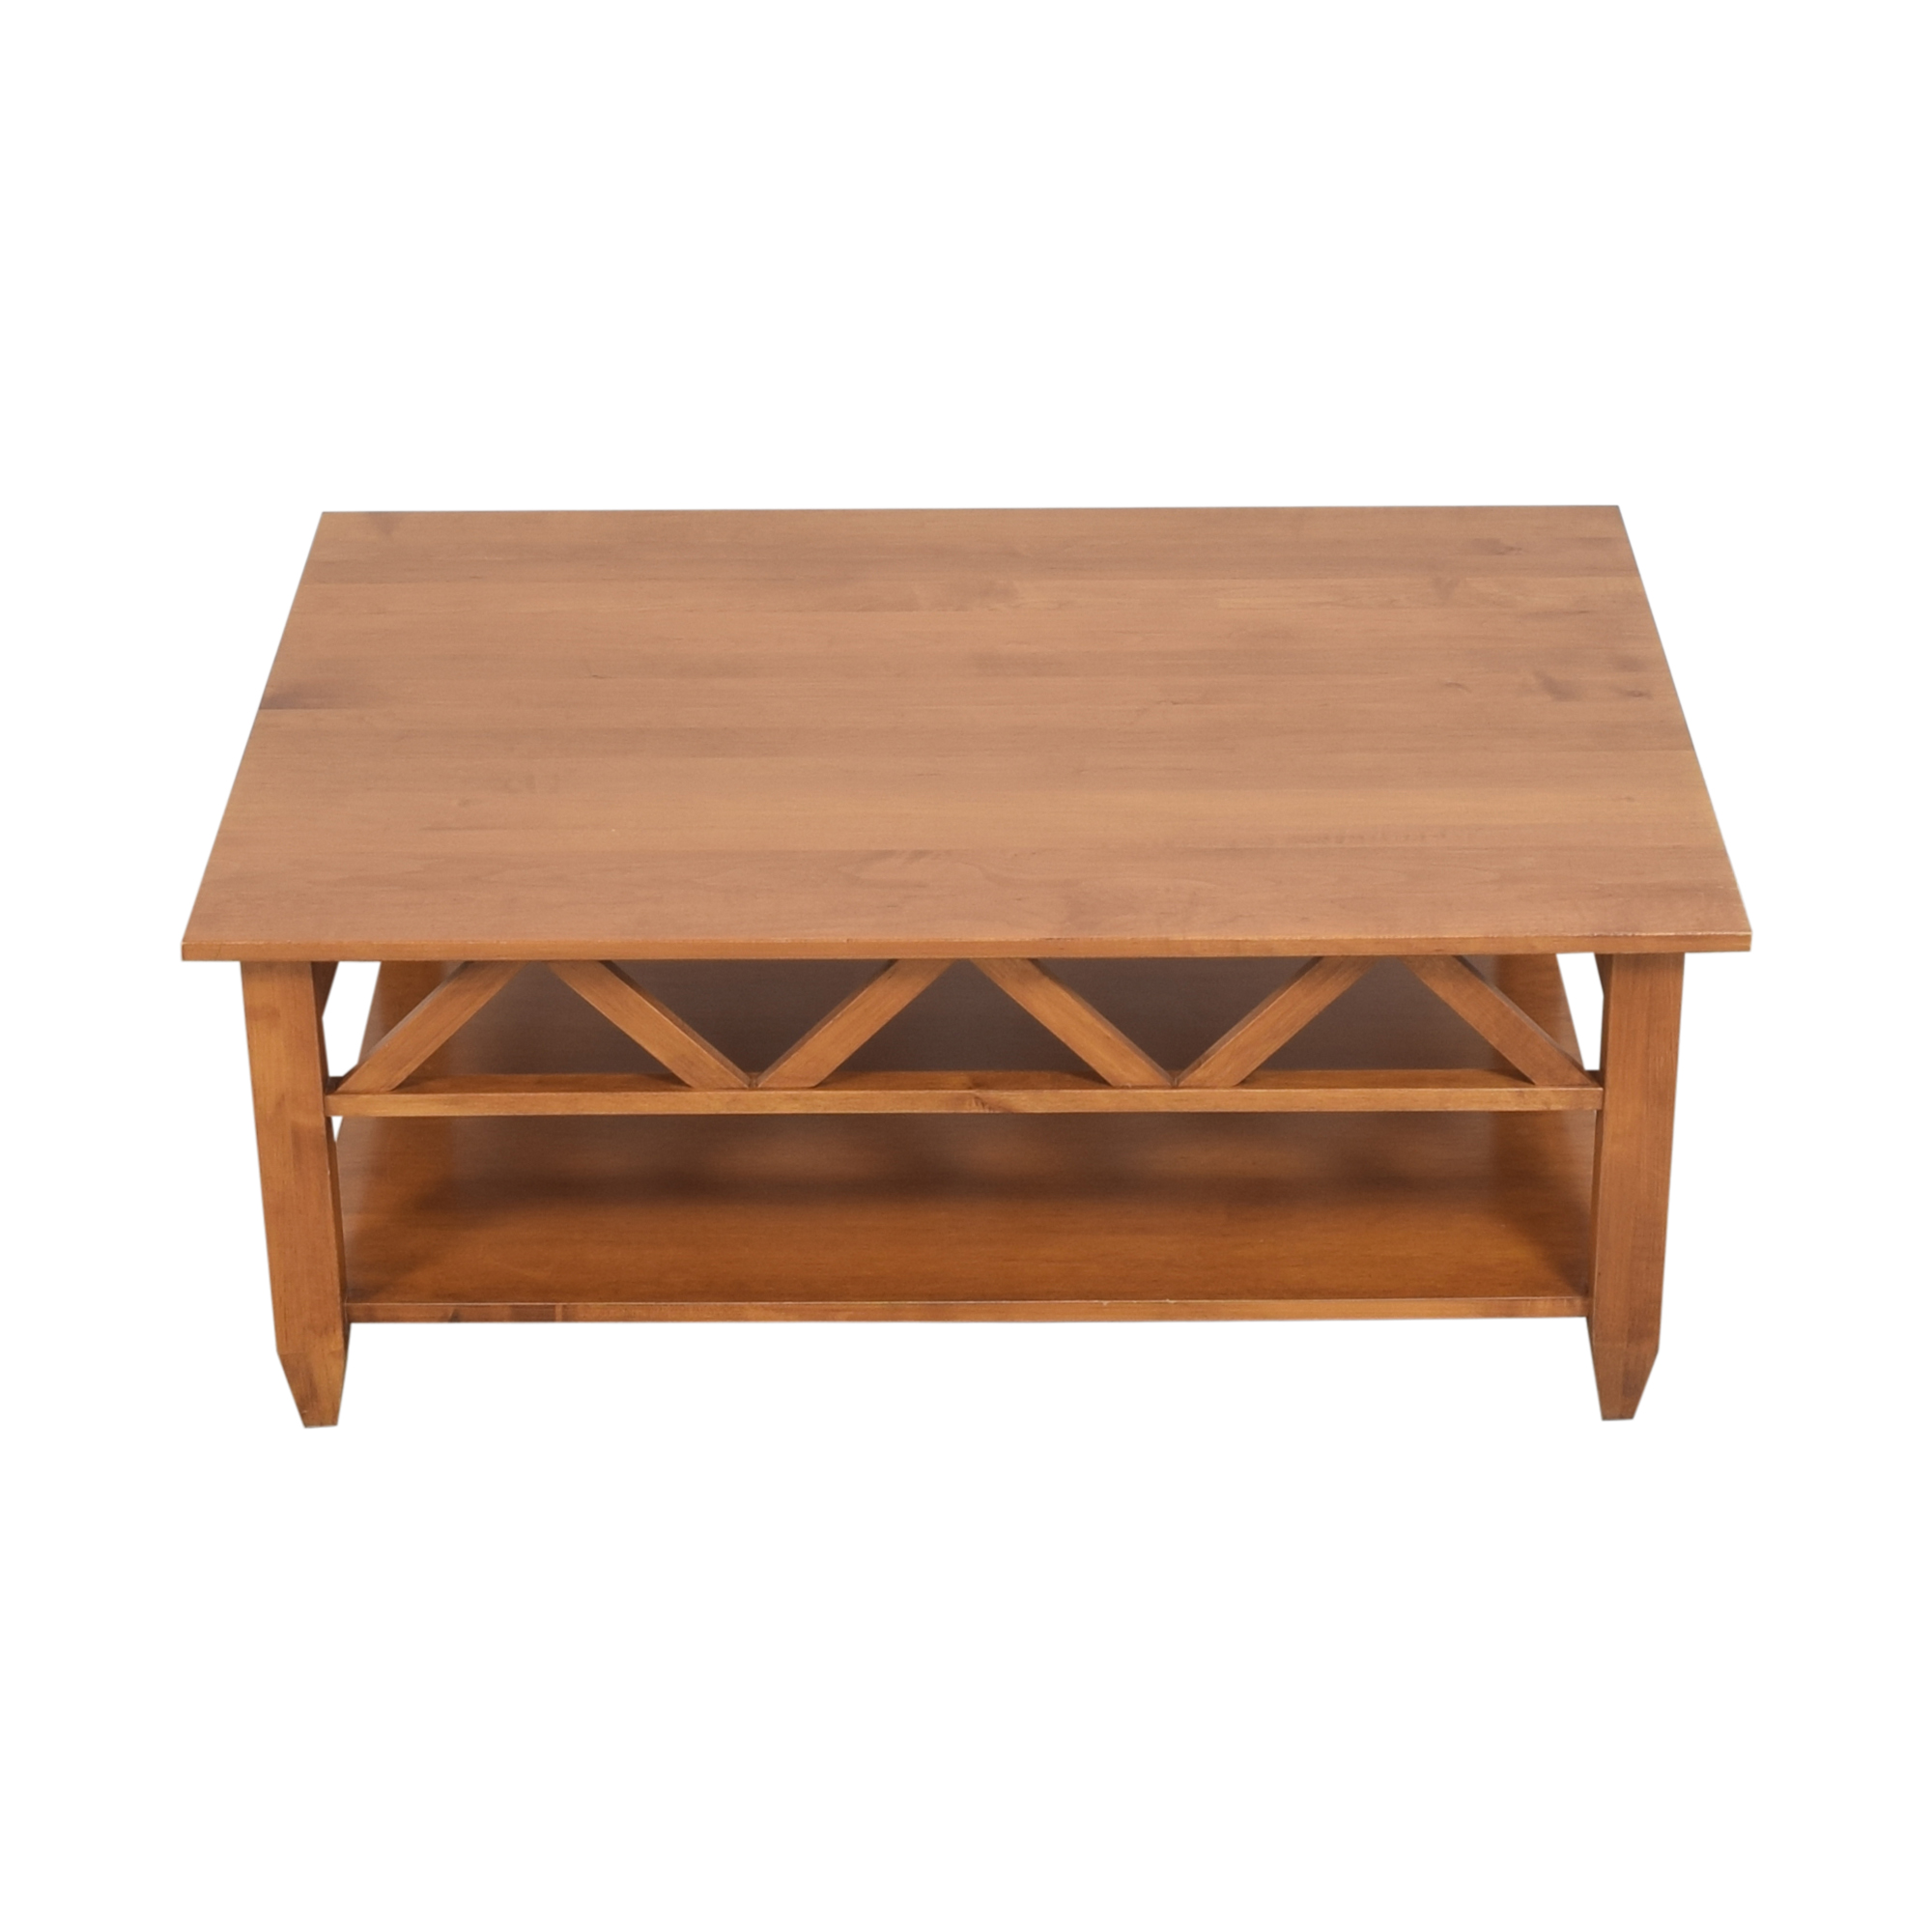 Ethan Allen Ethan Allen Rectangular Coffee Table nyc